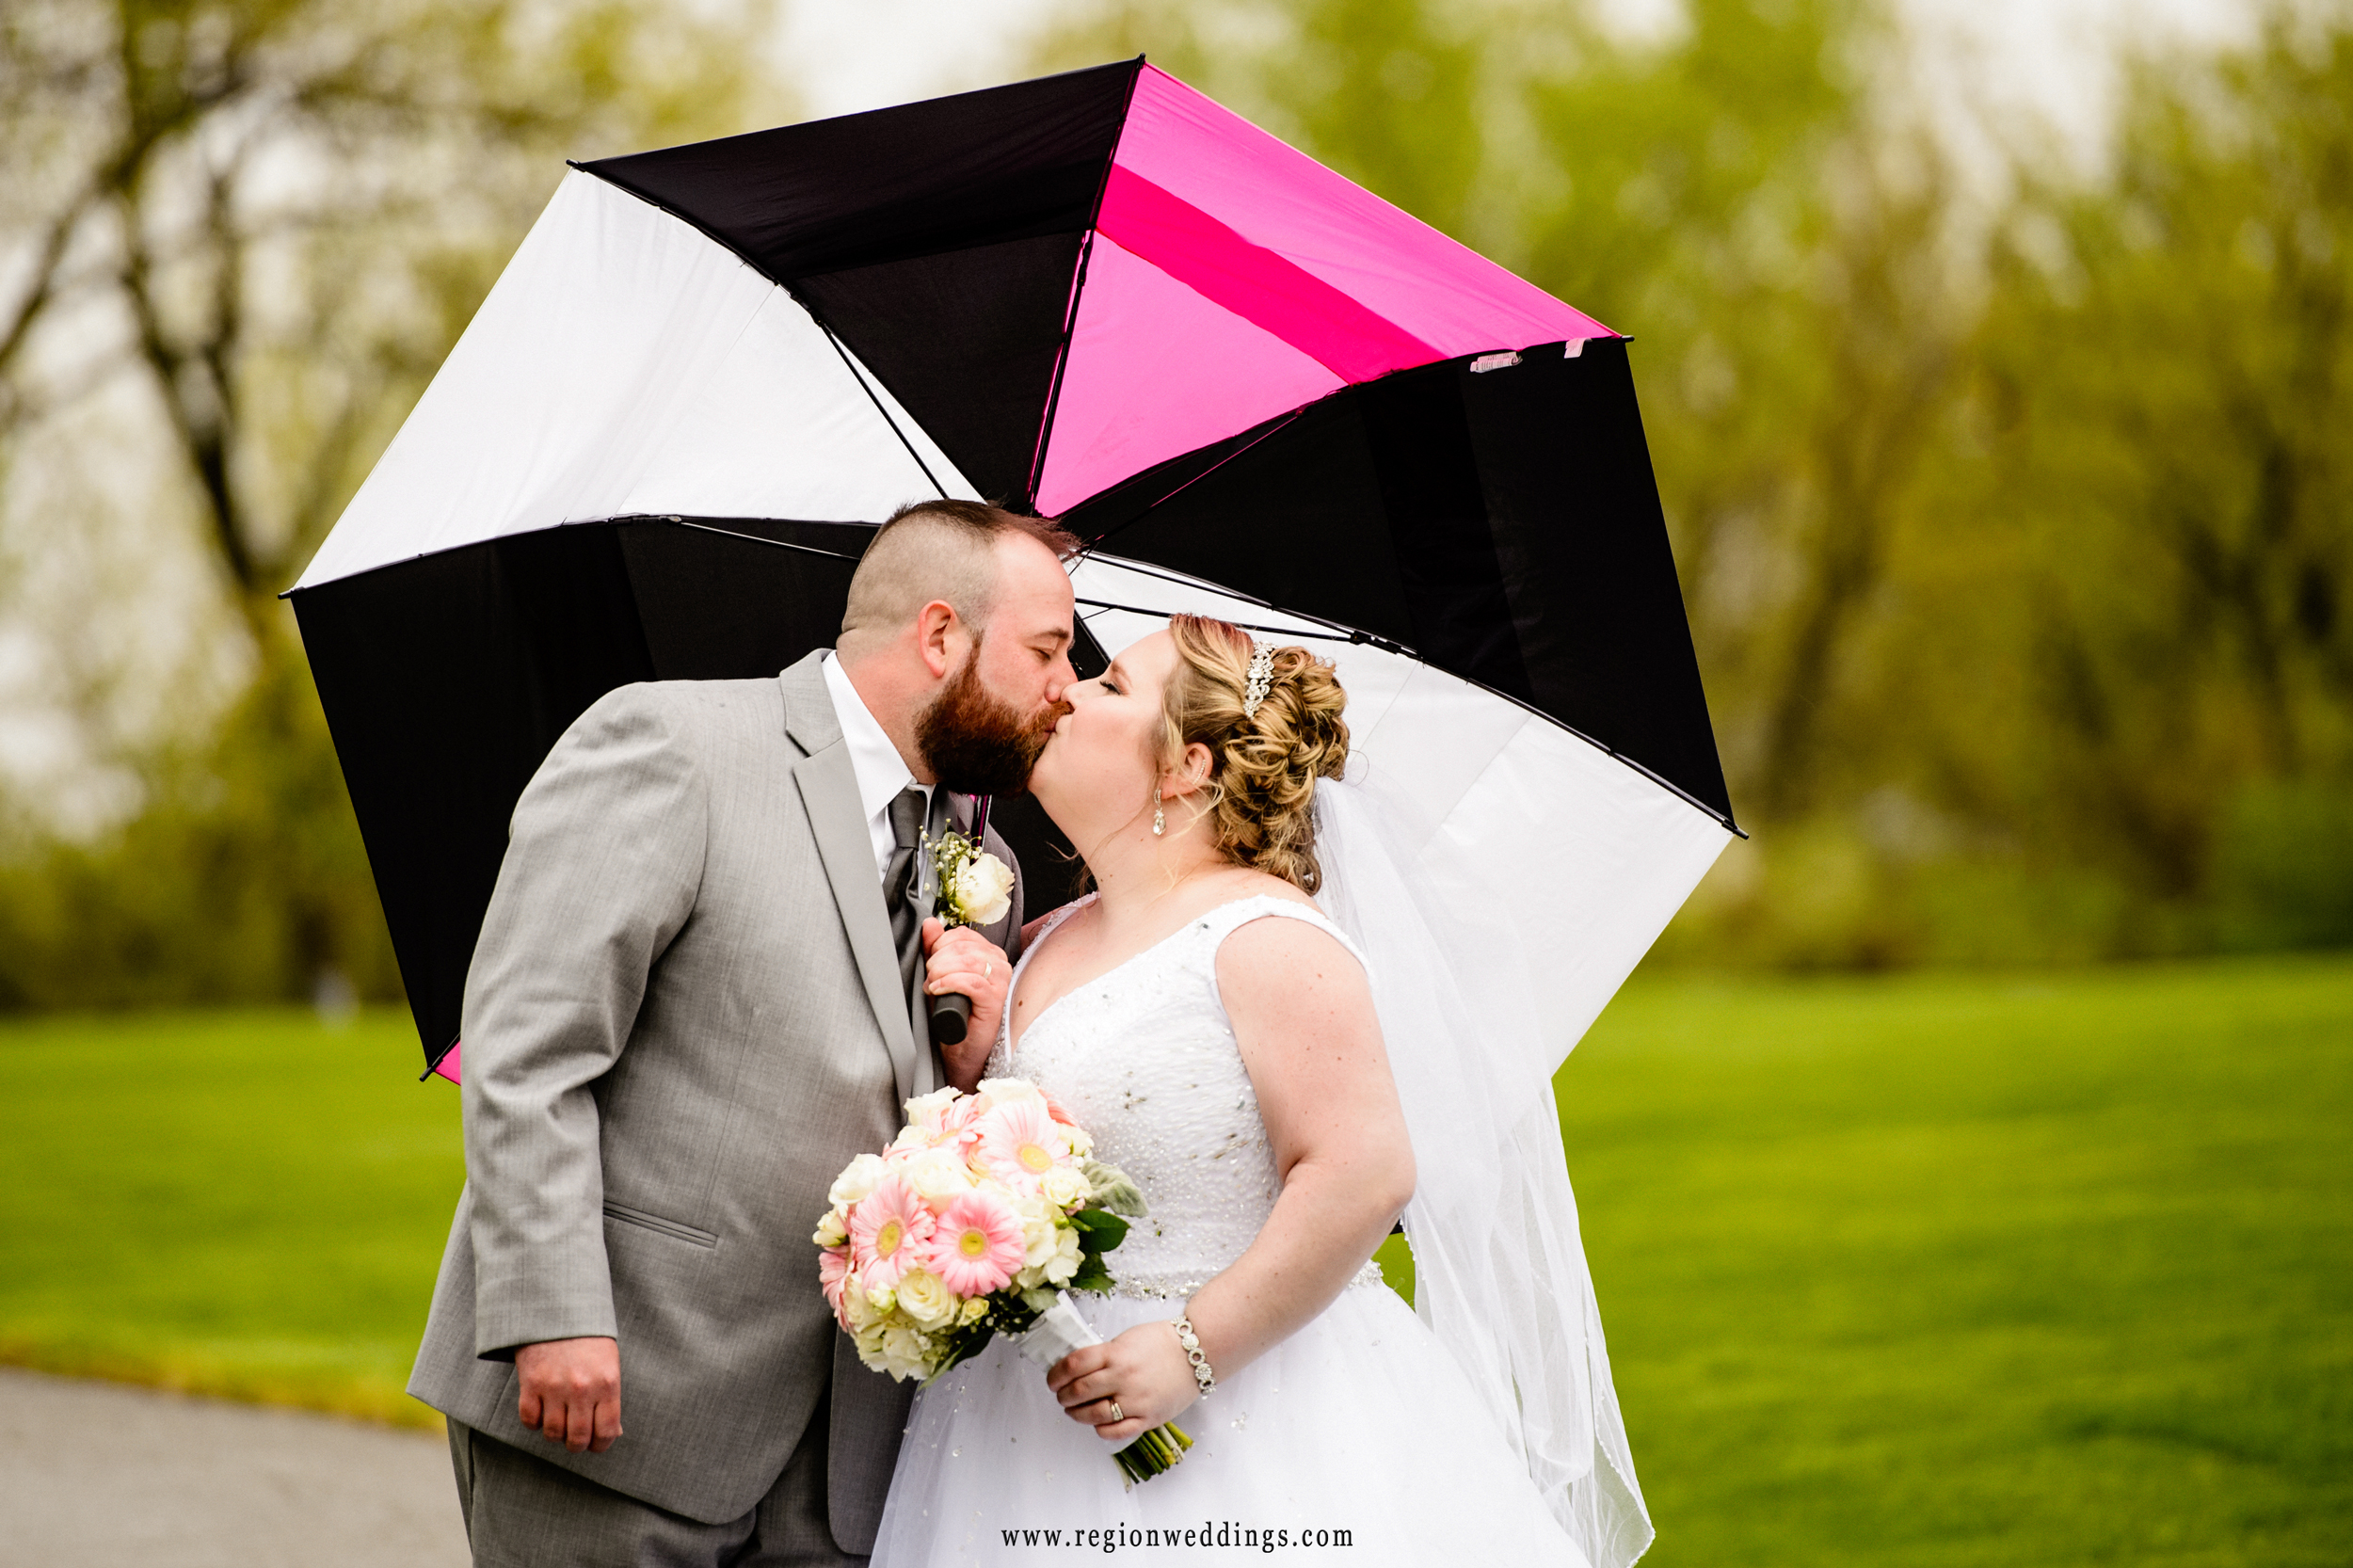 Bride and groom underneath a pink and black umbrella.